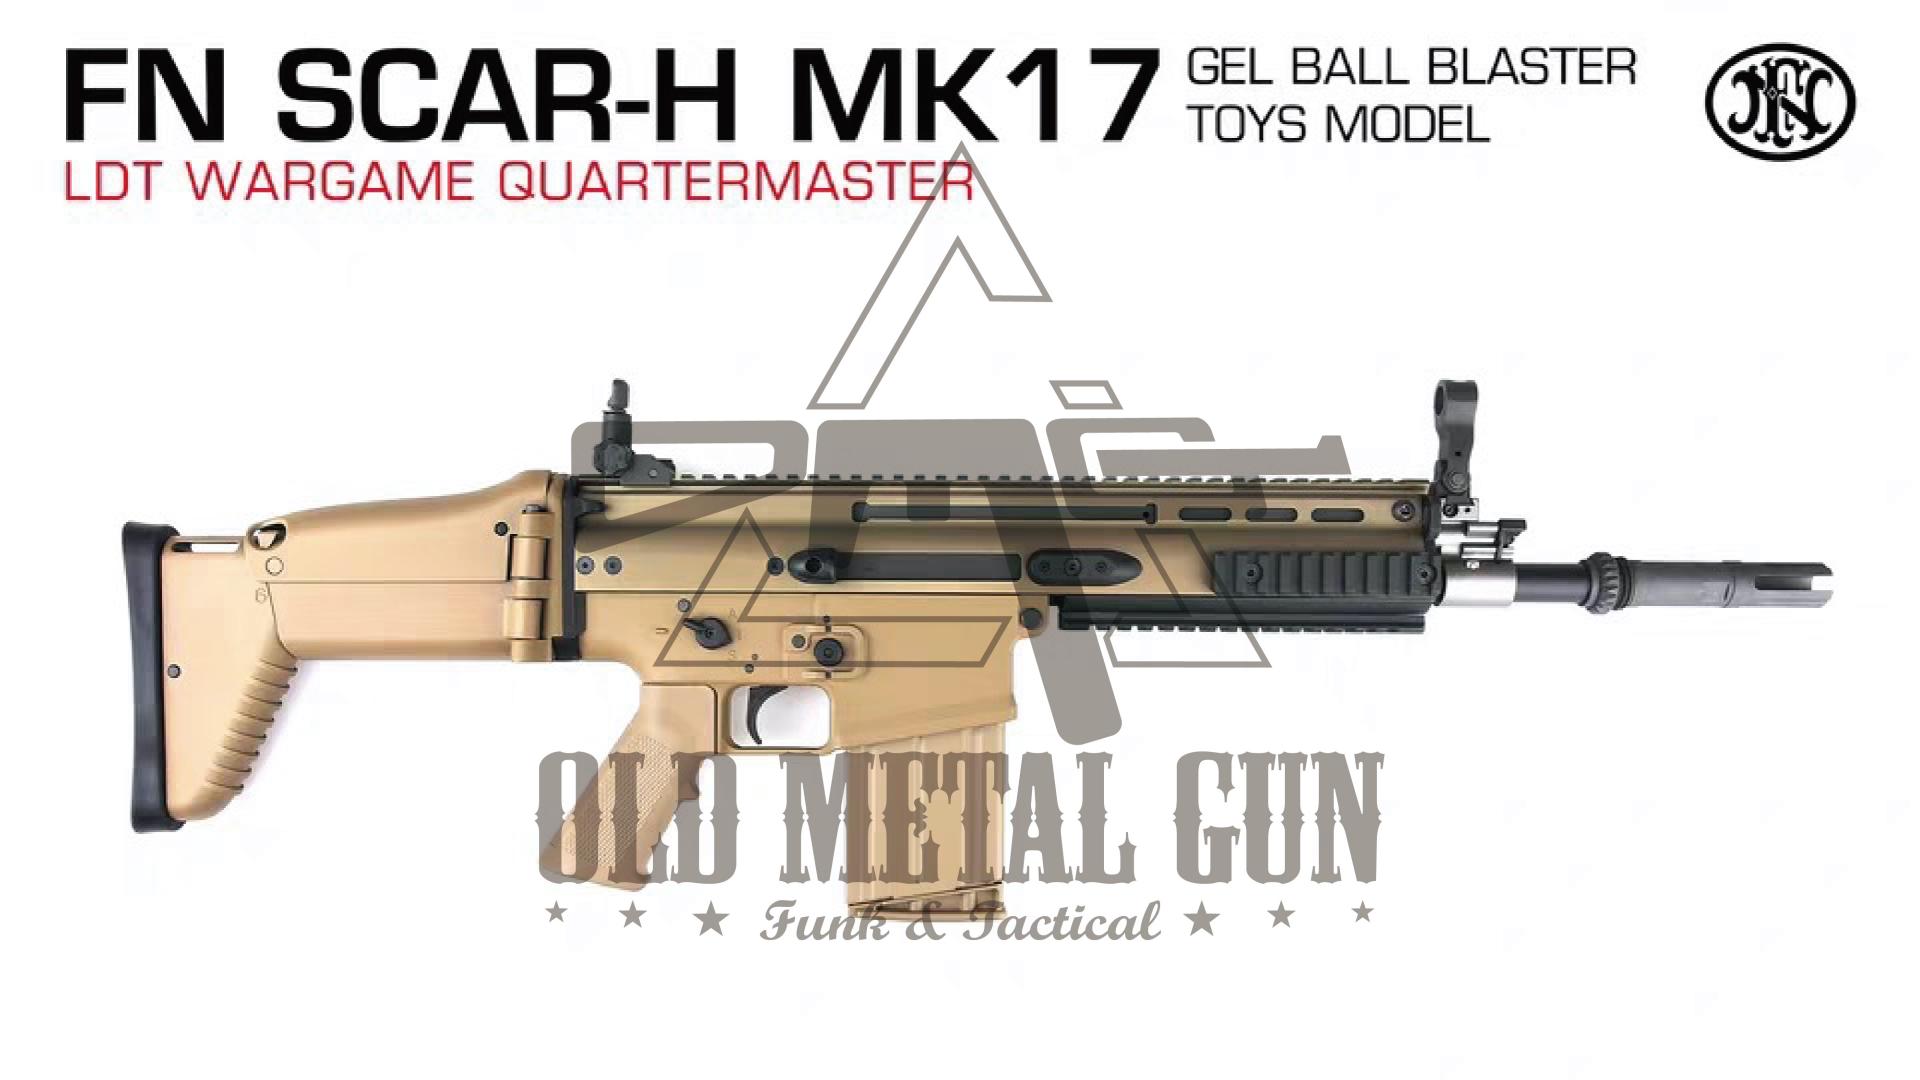 OMG【战术评说】LDT · SCAR-H MK17 土豪的玩具